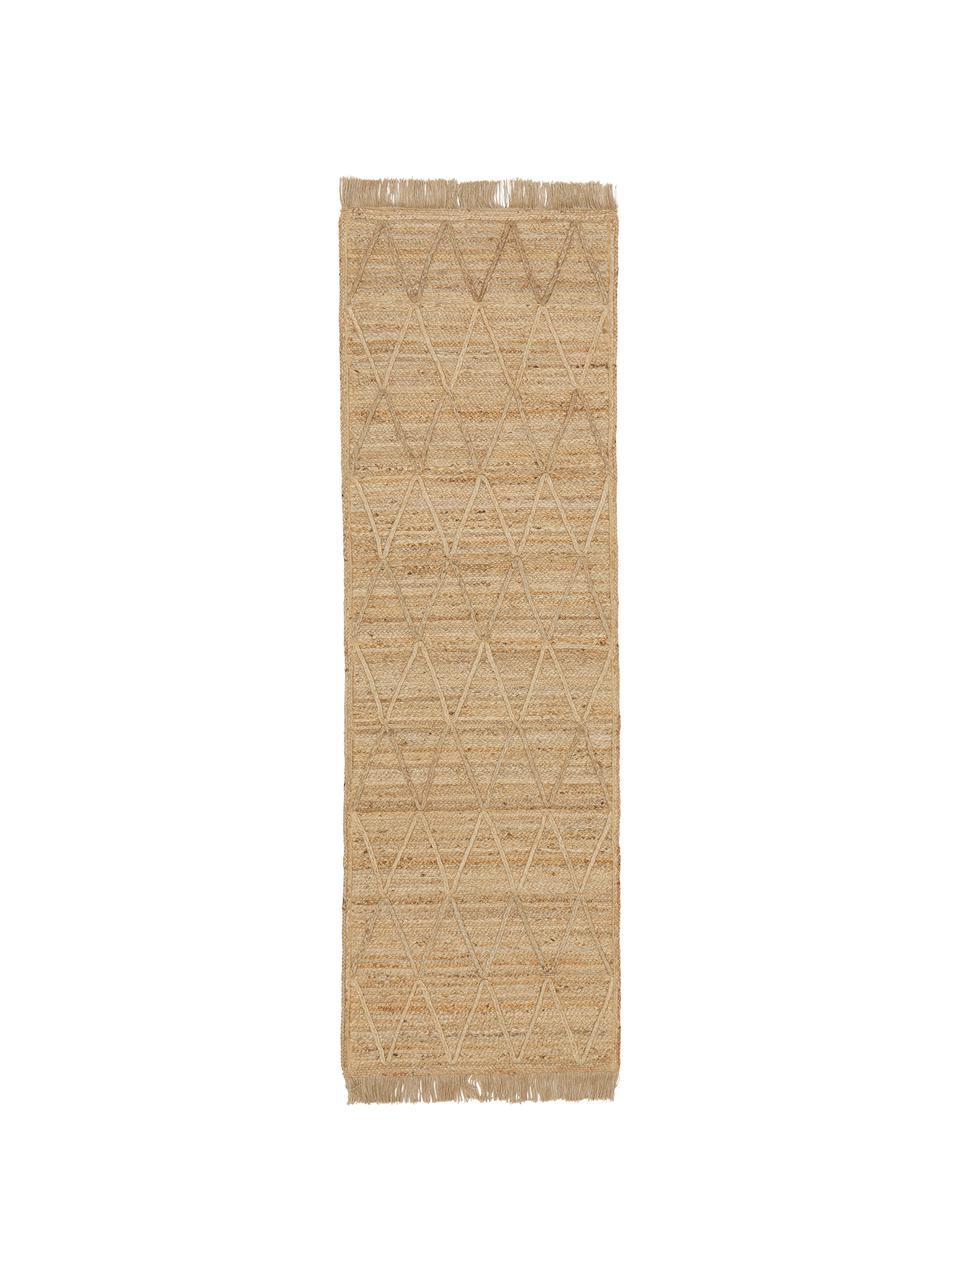 Handgemaakte juten loper Jason, 100% jute, Beige, 80 x 250 cm